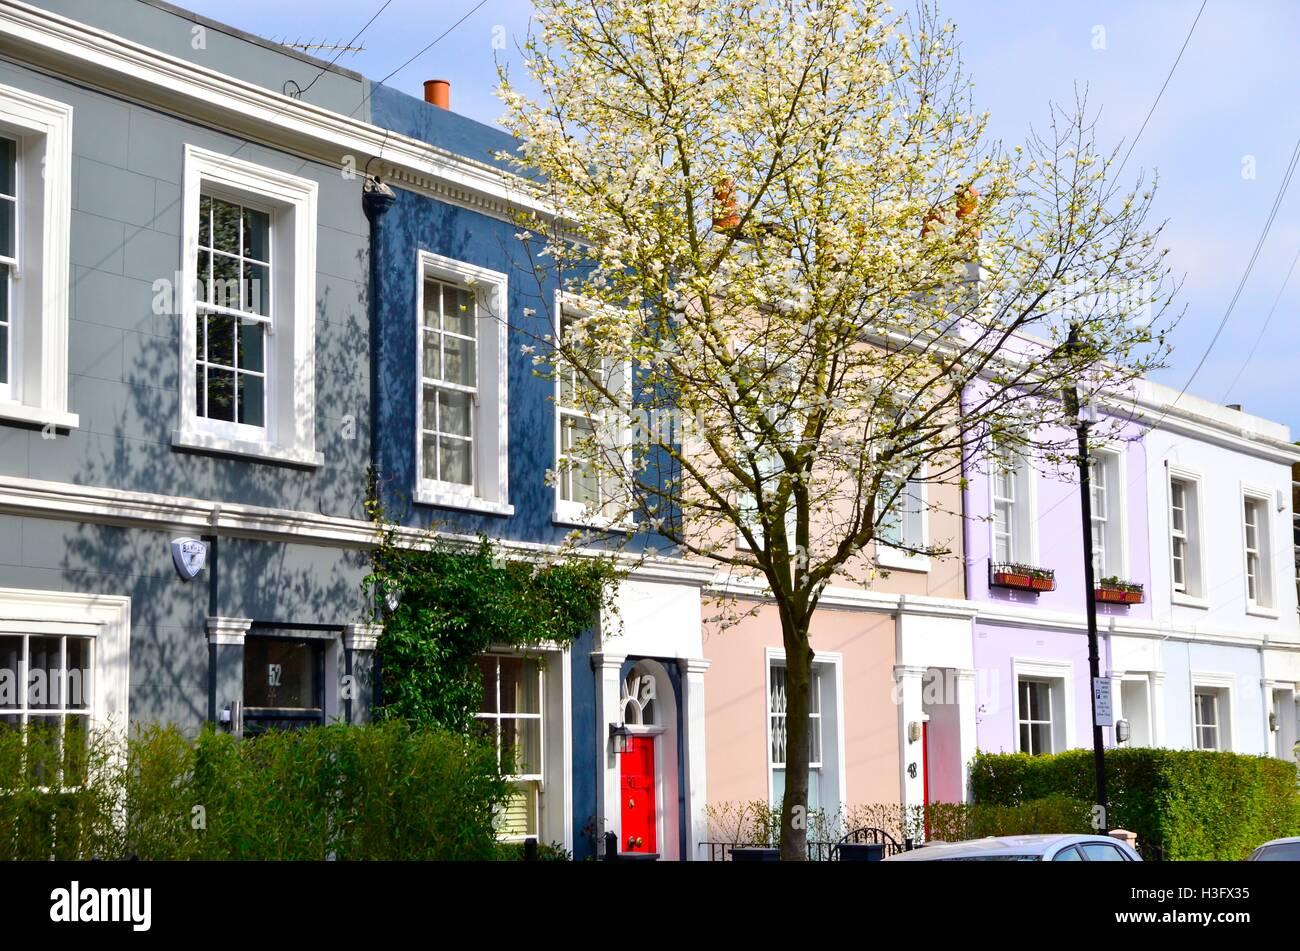 Colourful houses on Portobello Road, Notting Hill, London, England - Stock Image